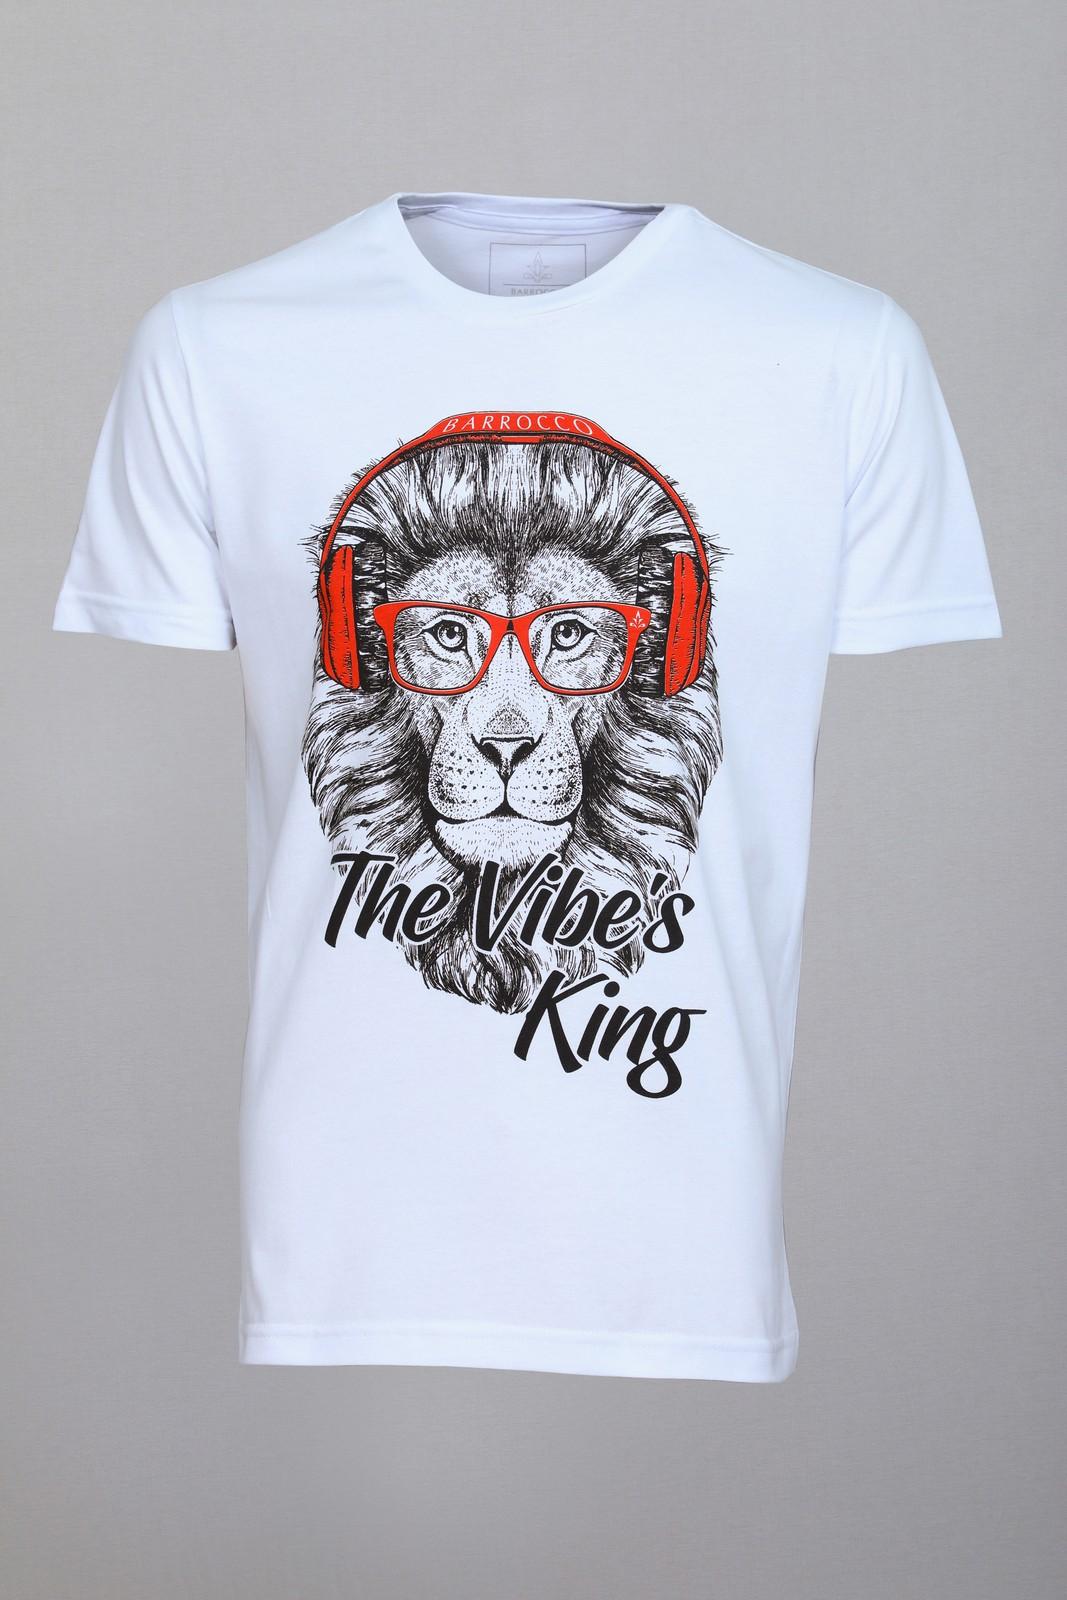 Camiseta Barrocco The Vibe´s King - FRETE GRÁTIS